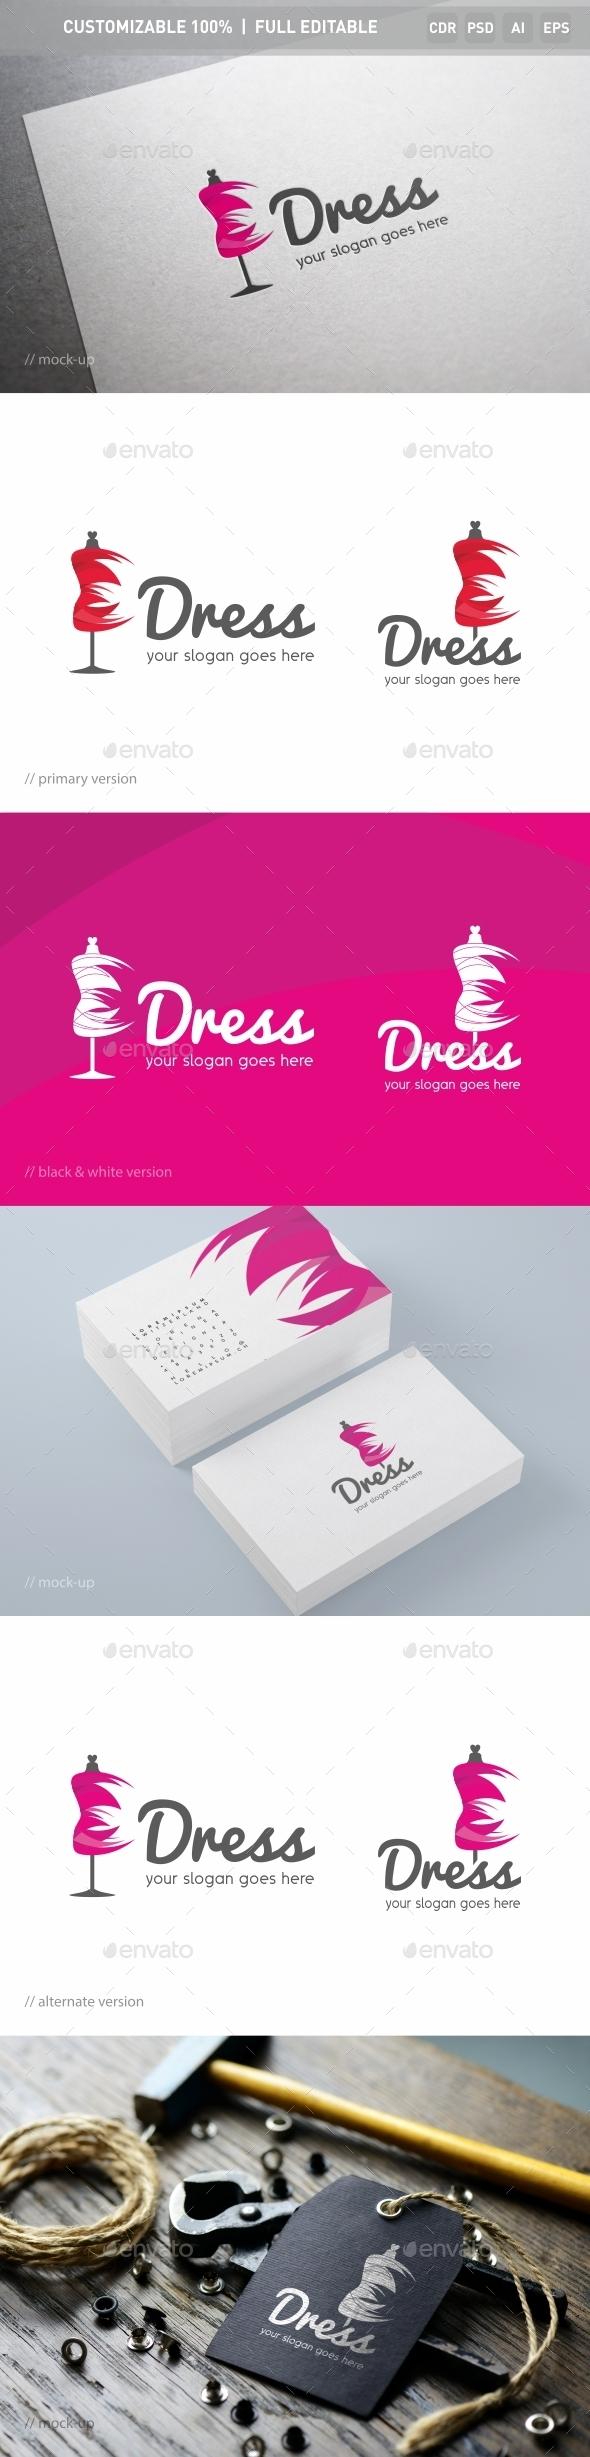 Dress Logo Template - Objects Logo Templates